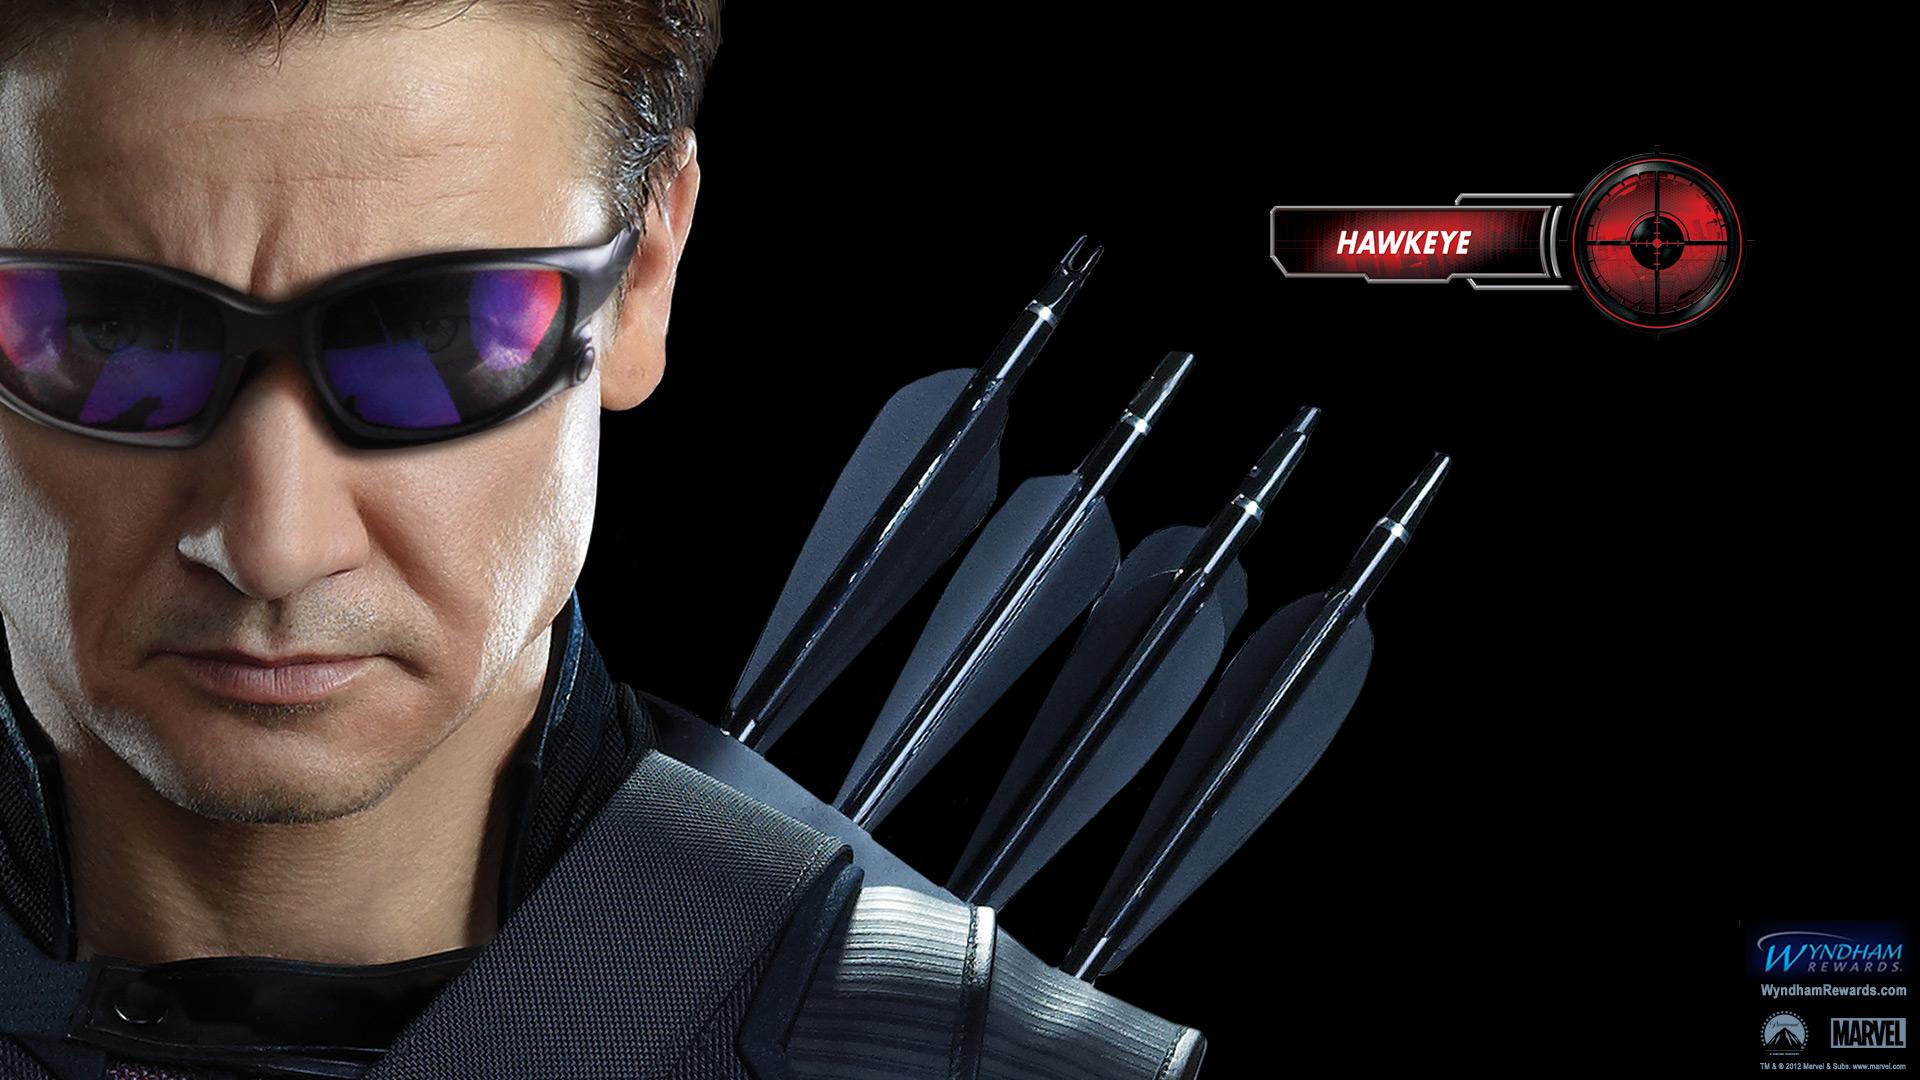 Hawkeye   The Avengers Wallpaper 30730301 1920x1080